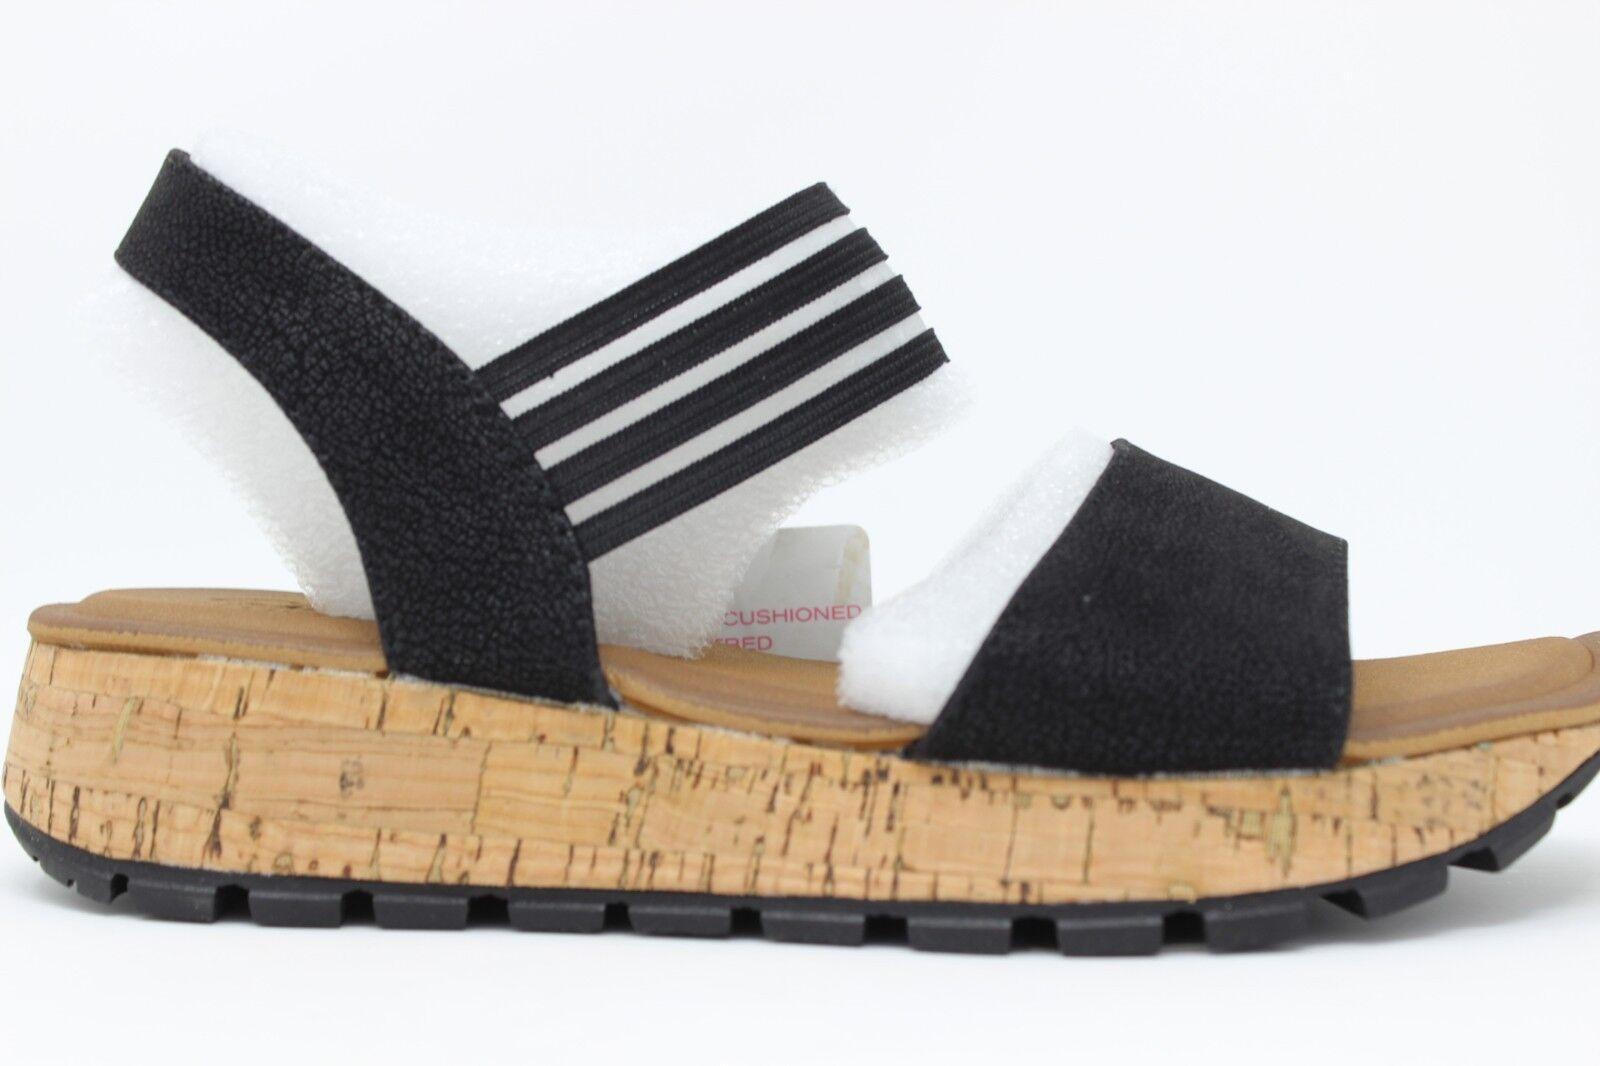 Skechers Damen Bequemer Step Footsteps-Markers Schwarz 31700 31700 31700 / Blk mit Luxe c7279c